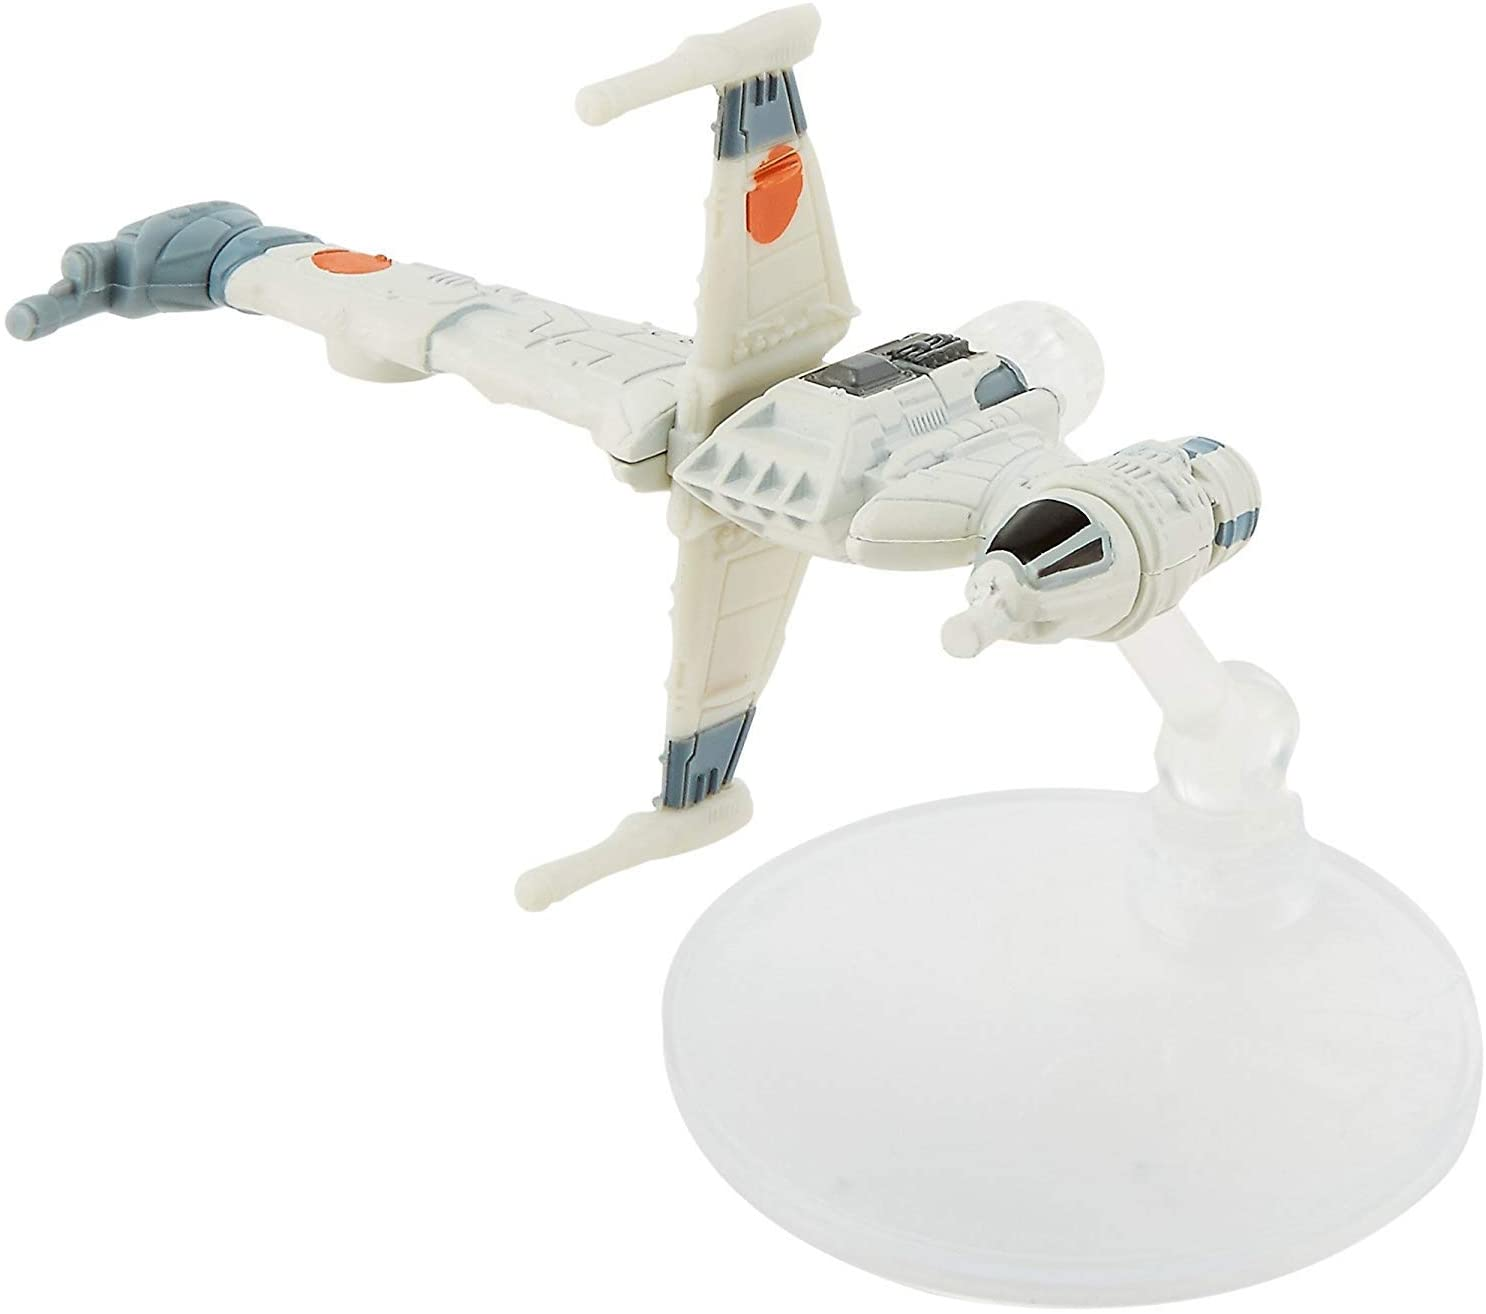 B-Wing Fighter (Starship)